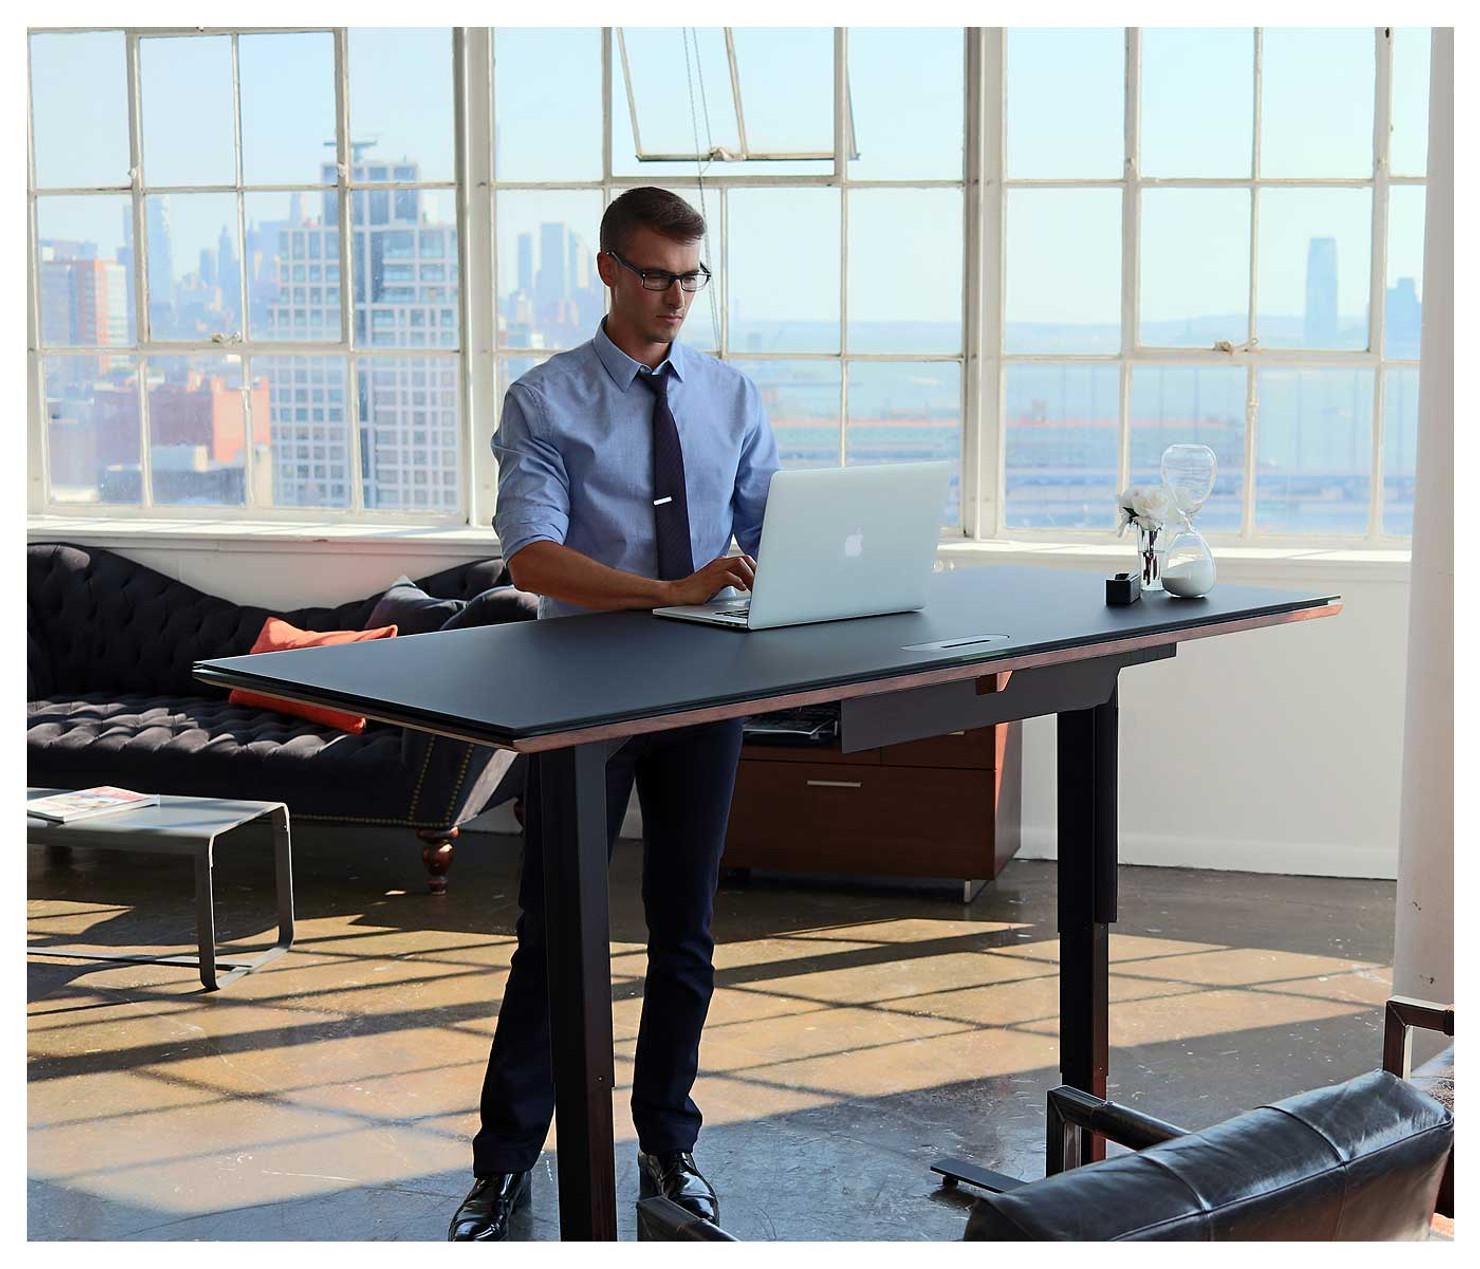 BDI Sequel 40 Lift Desk 40